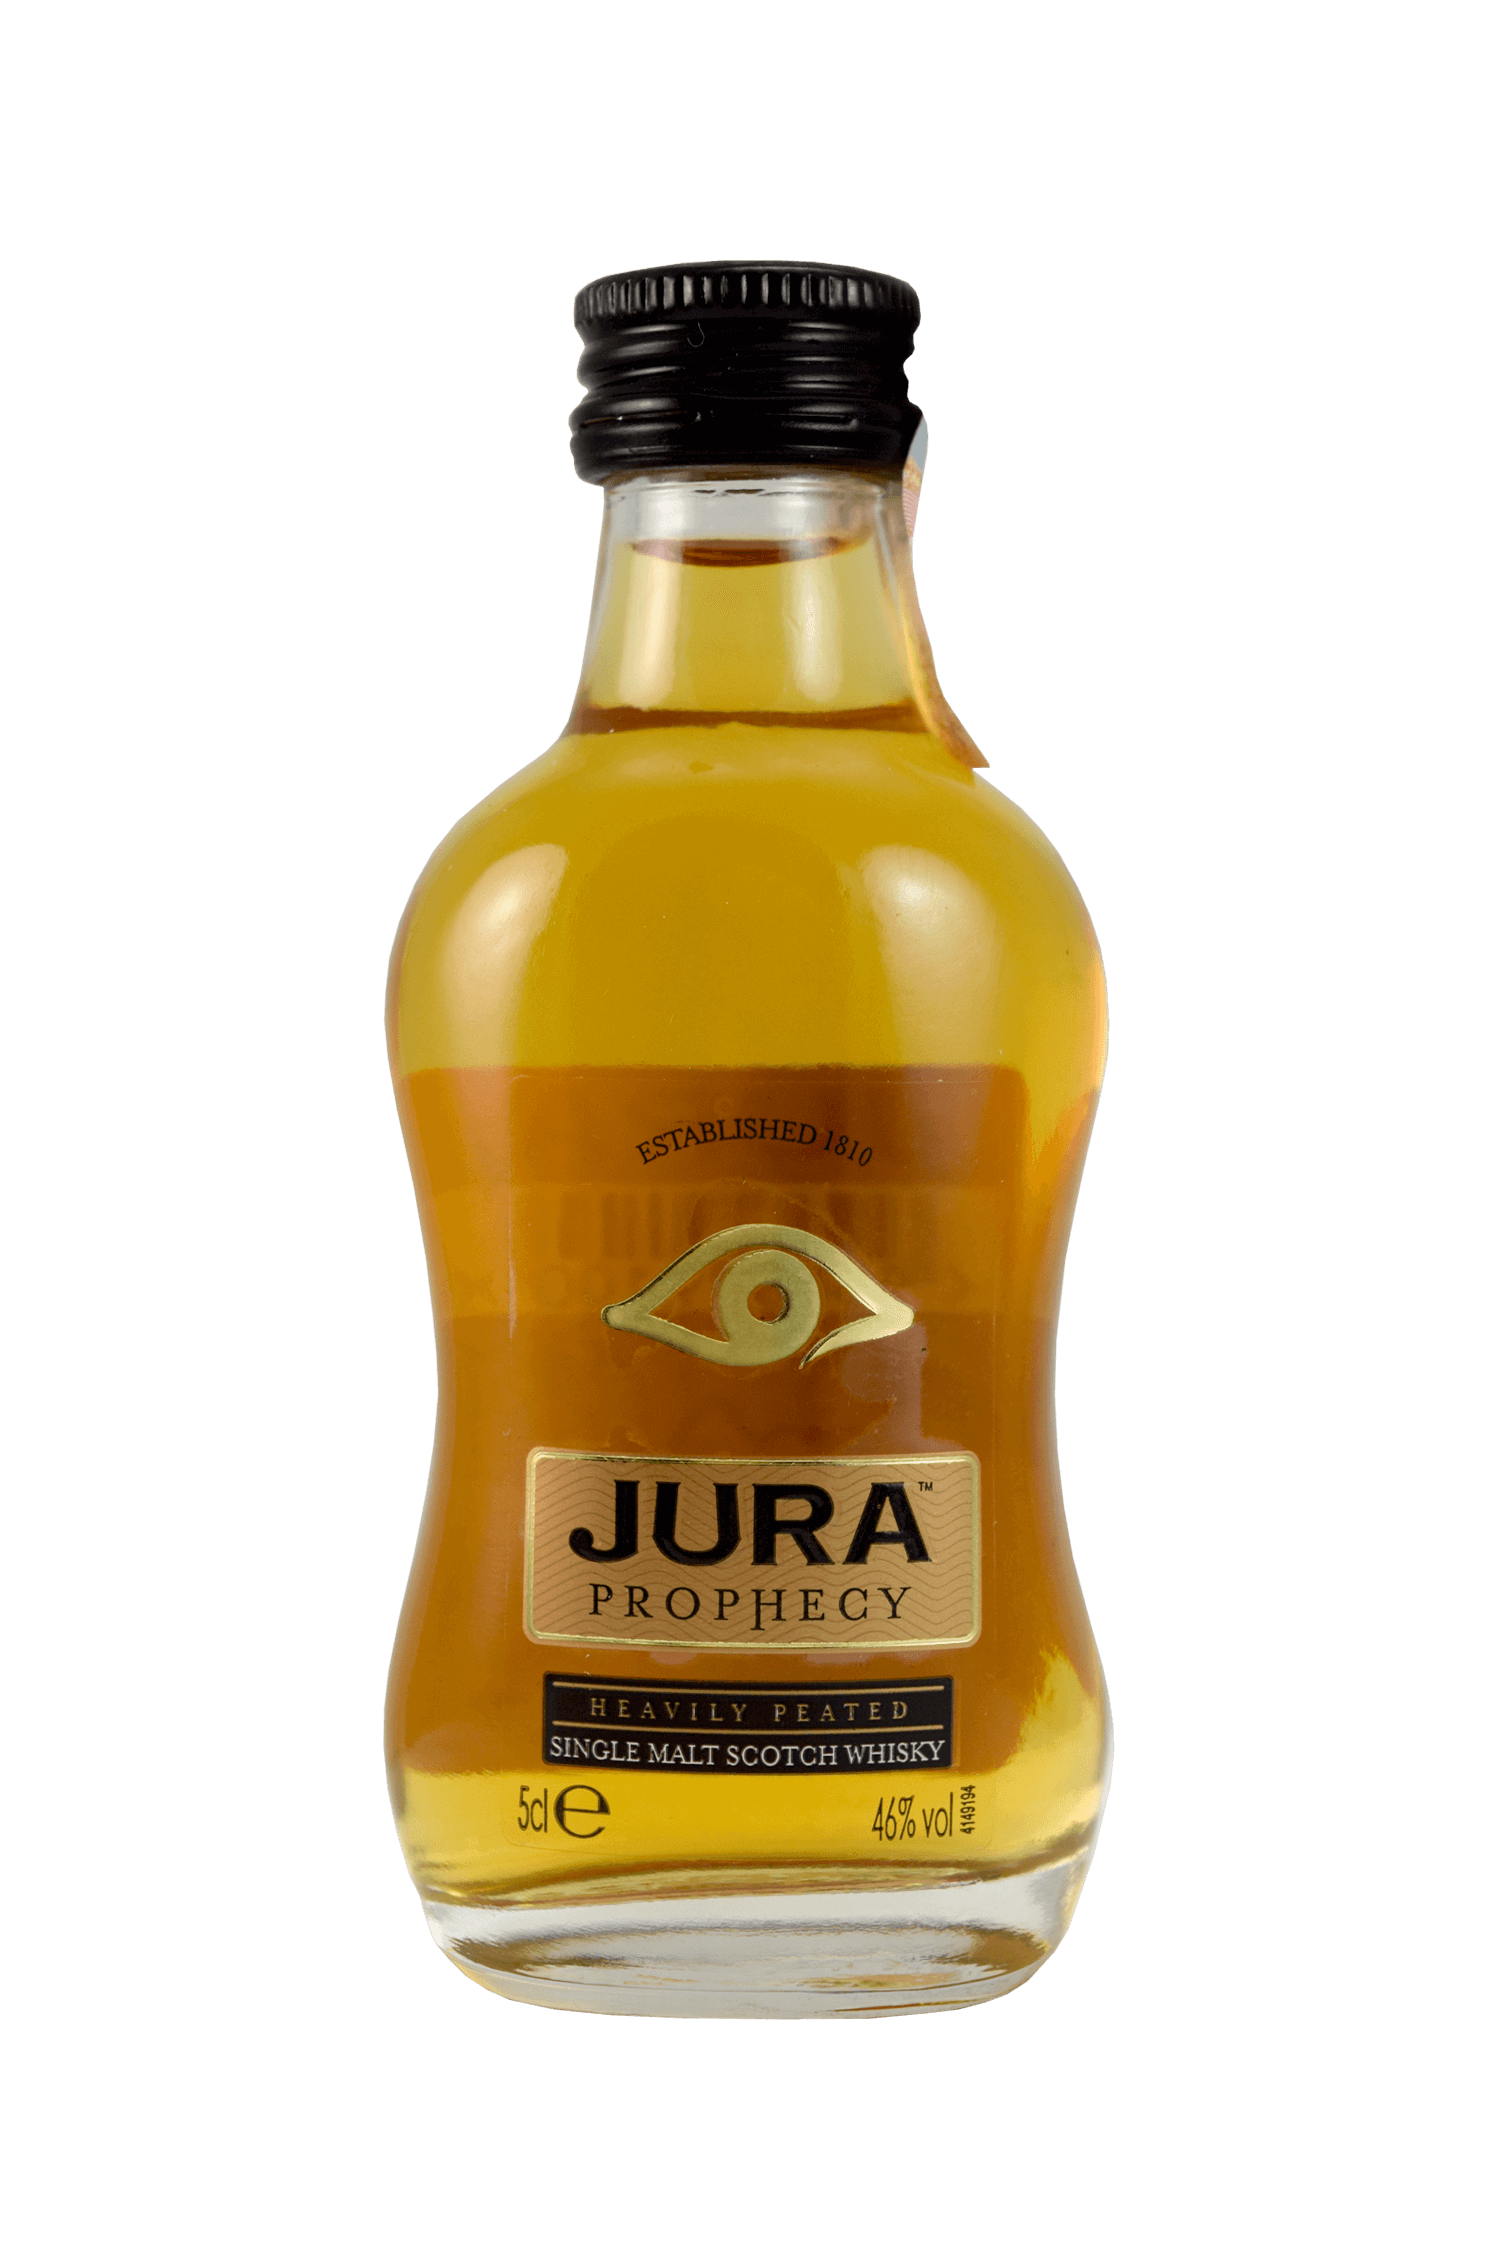 Jura Prophecy Whisky